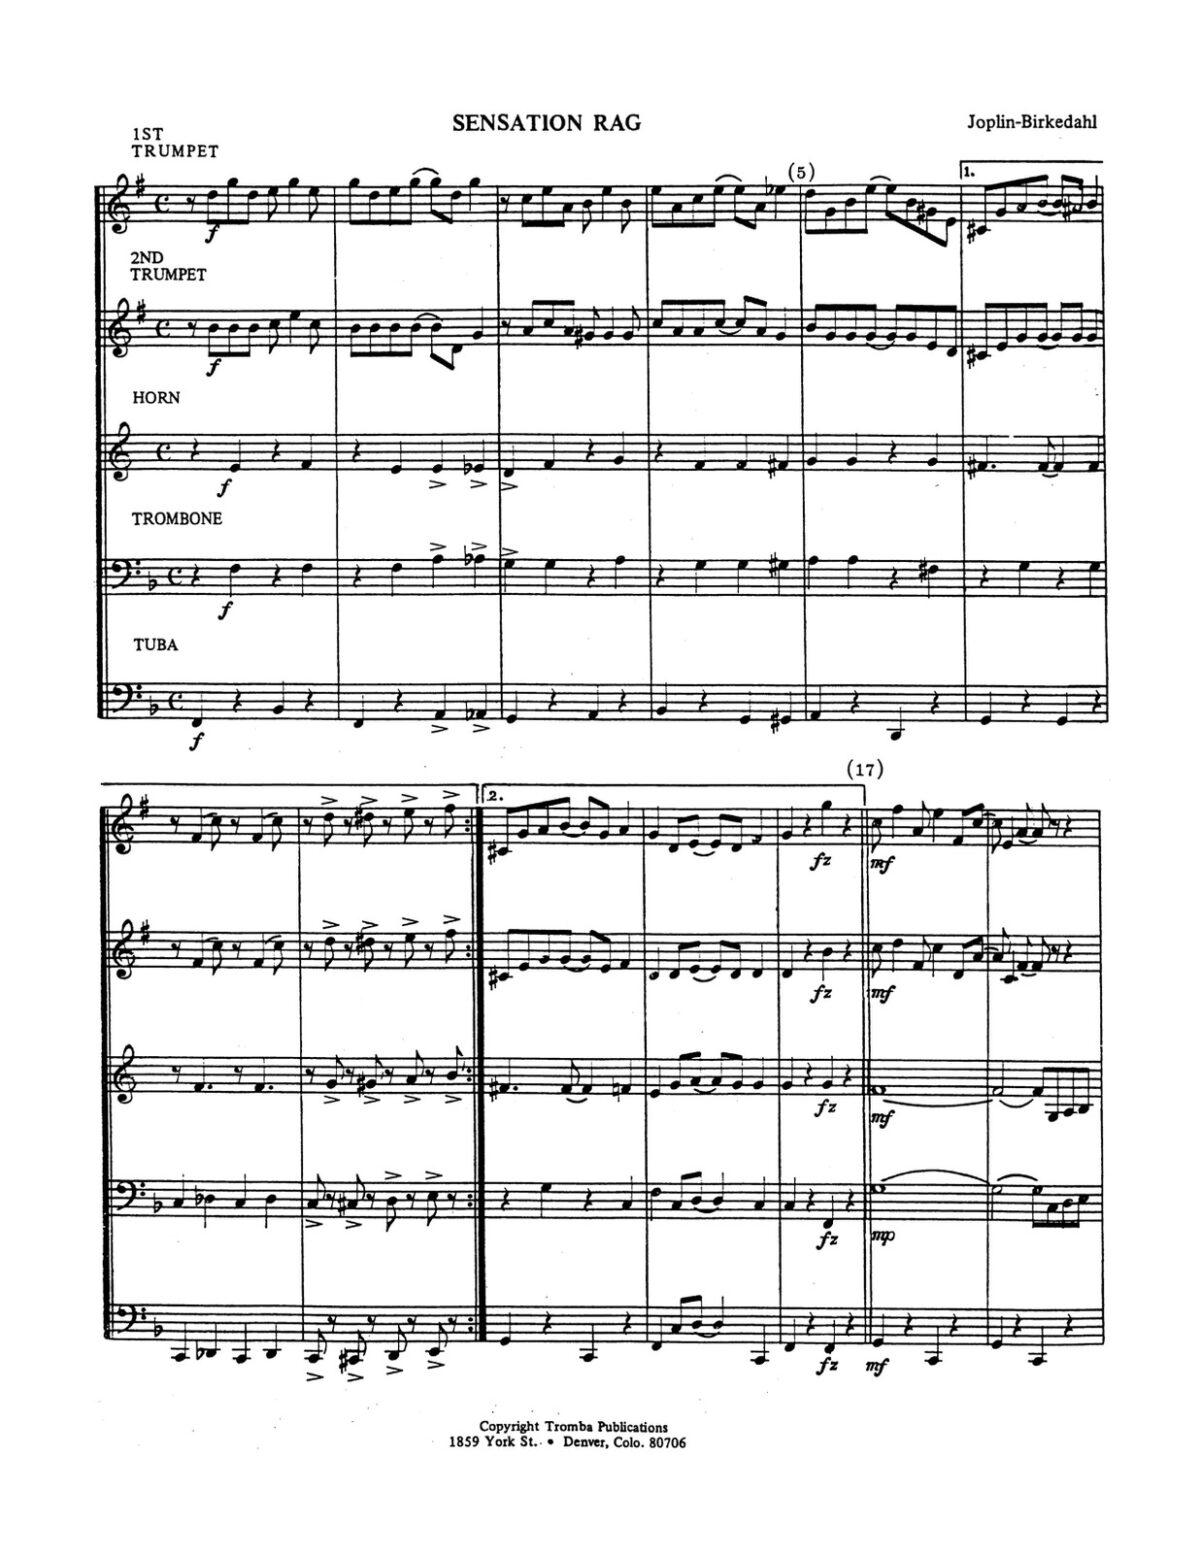 Joplin arr. Birkedahl, The Sensation Rag-p13